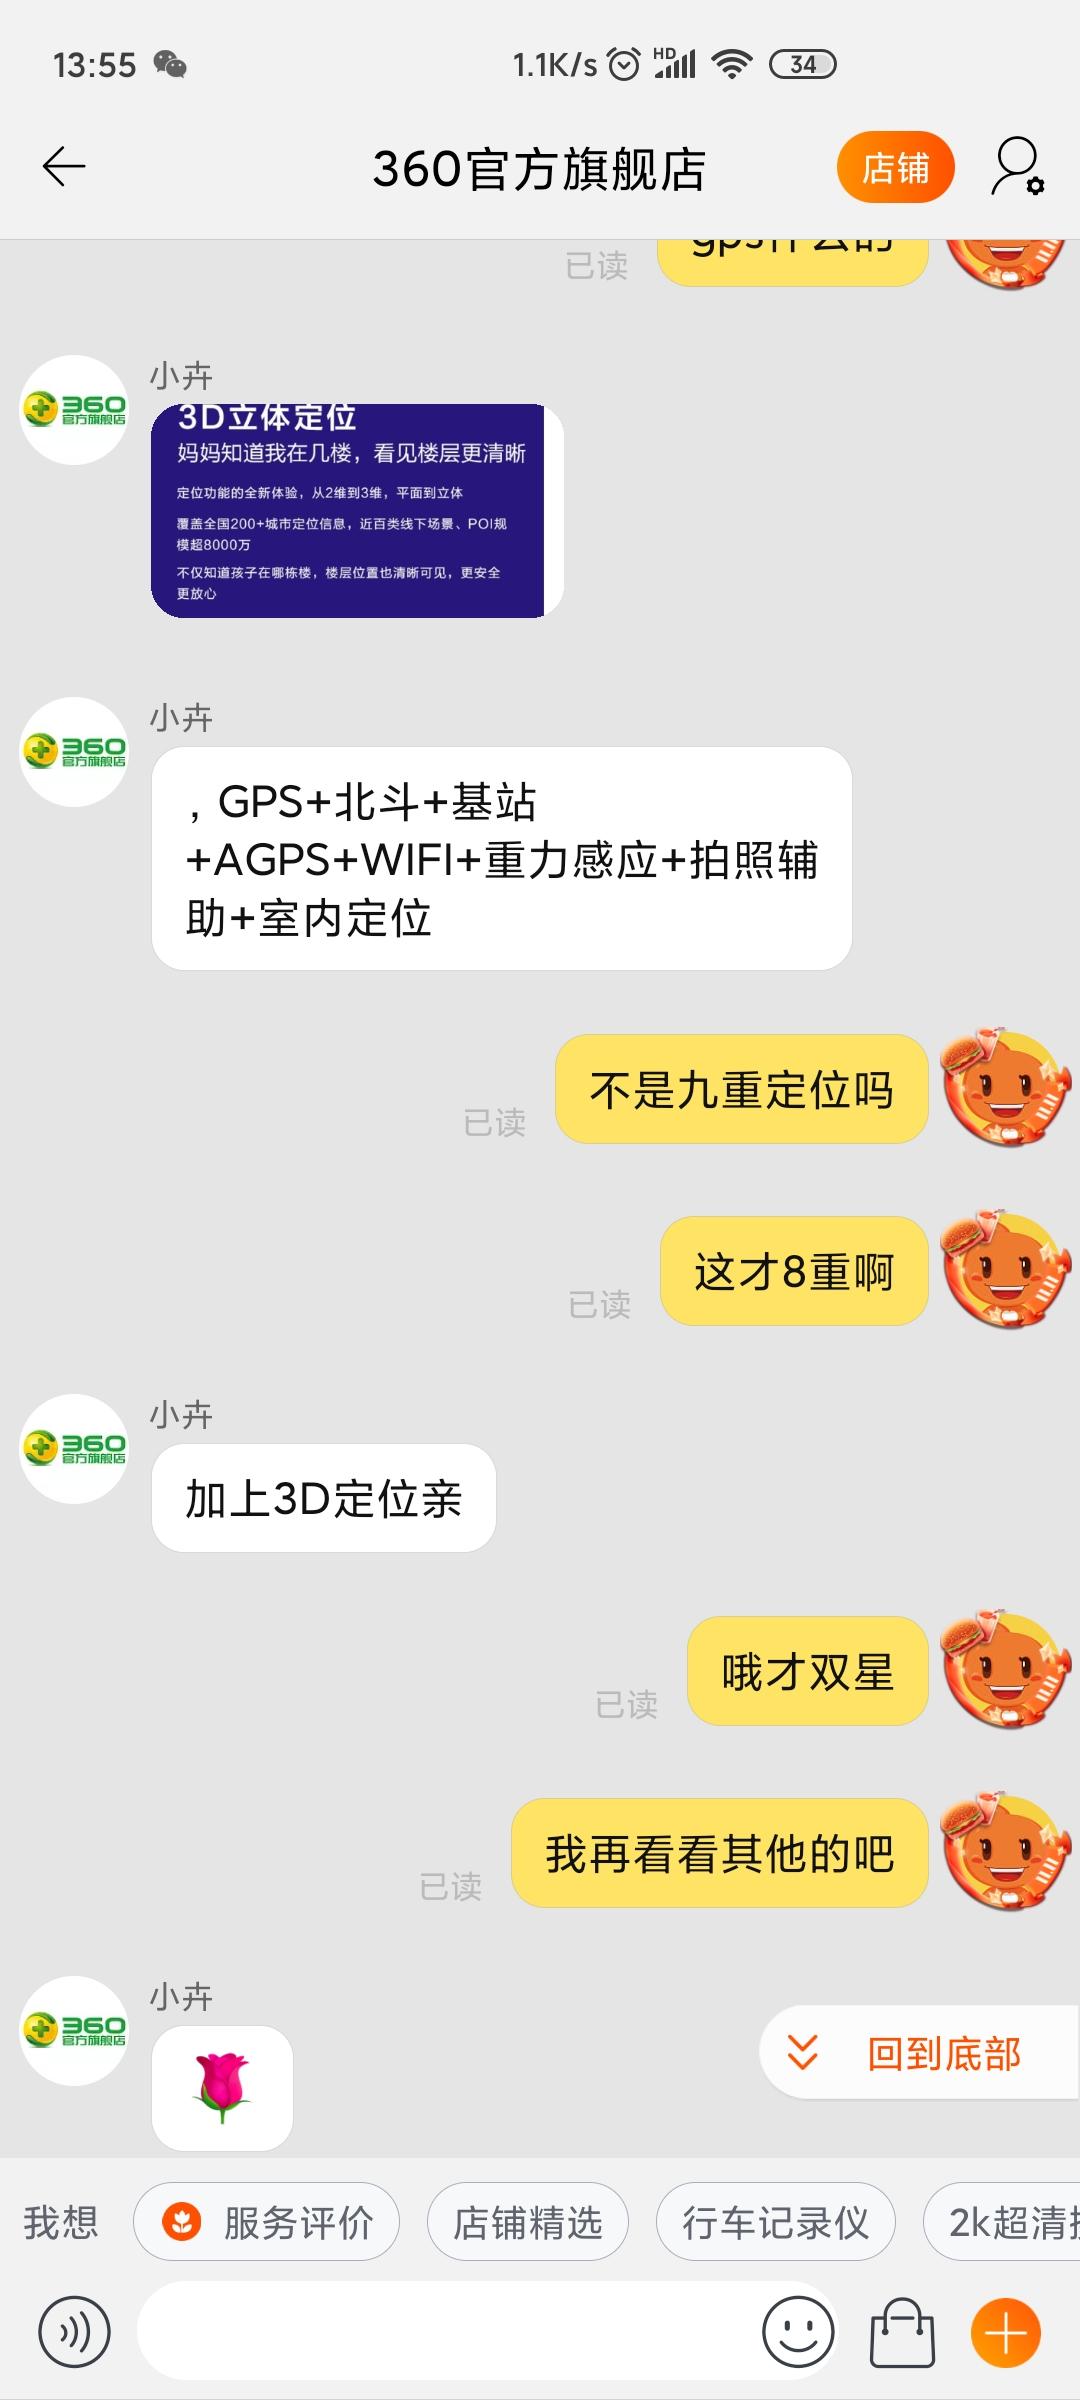 Screenshot_2020-10-14-13-55-27-625_com.taobao.taobao.jpg